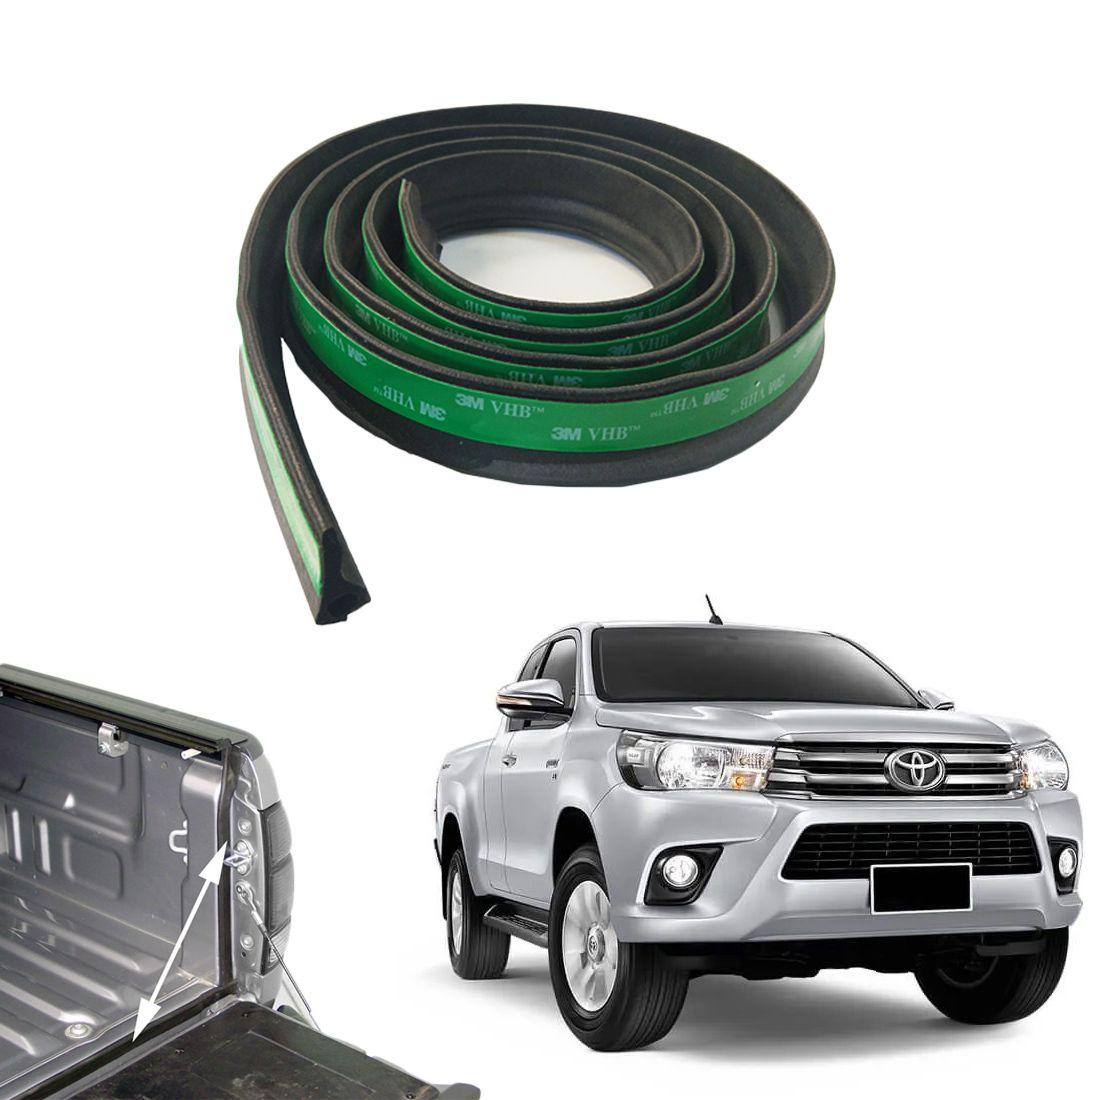 Borracha Veda Caçamba Toyota Hilux 2016 a 2020